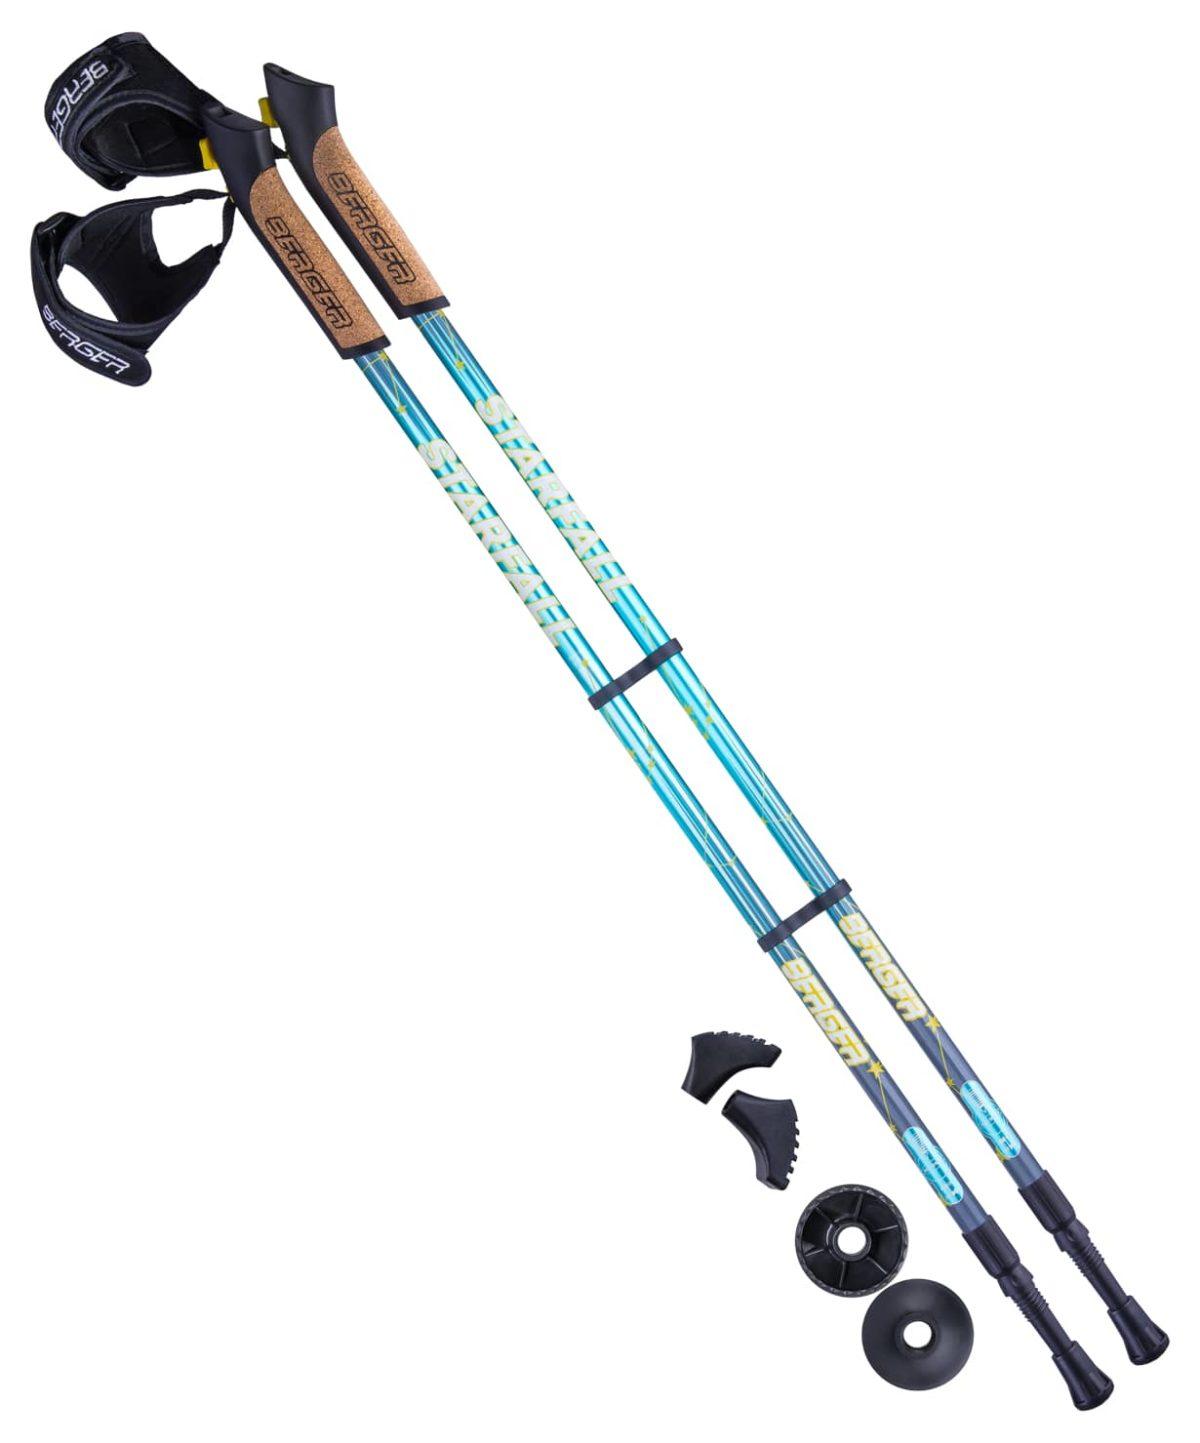 BERGER Starfall Палки для скандинавской ходьбы, 77-135 см: синий/серый/жёлтый - 1